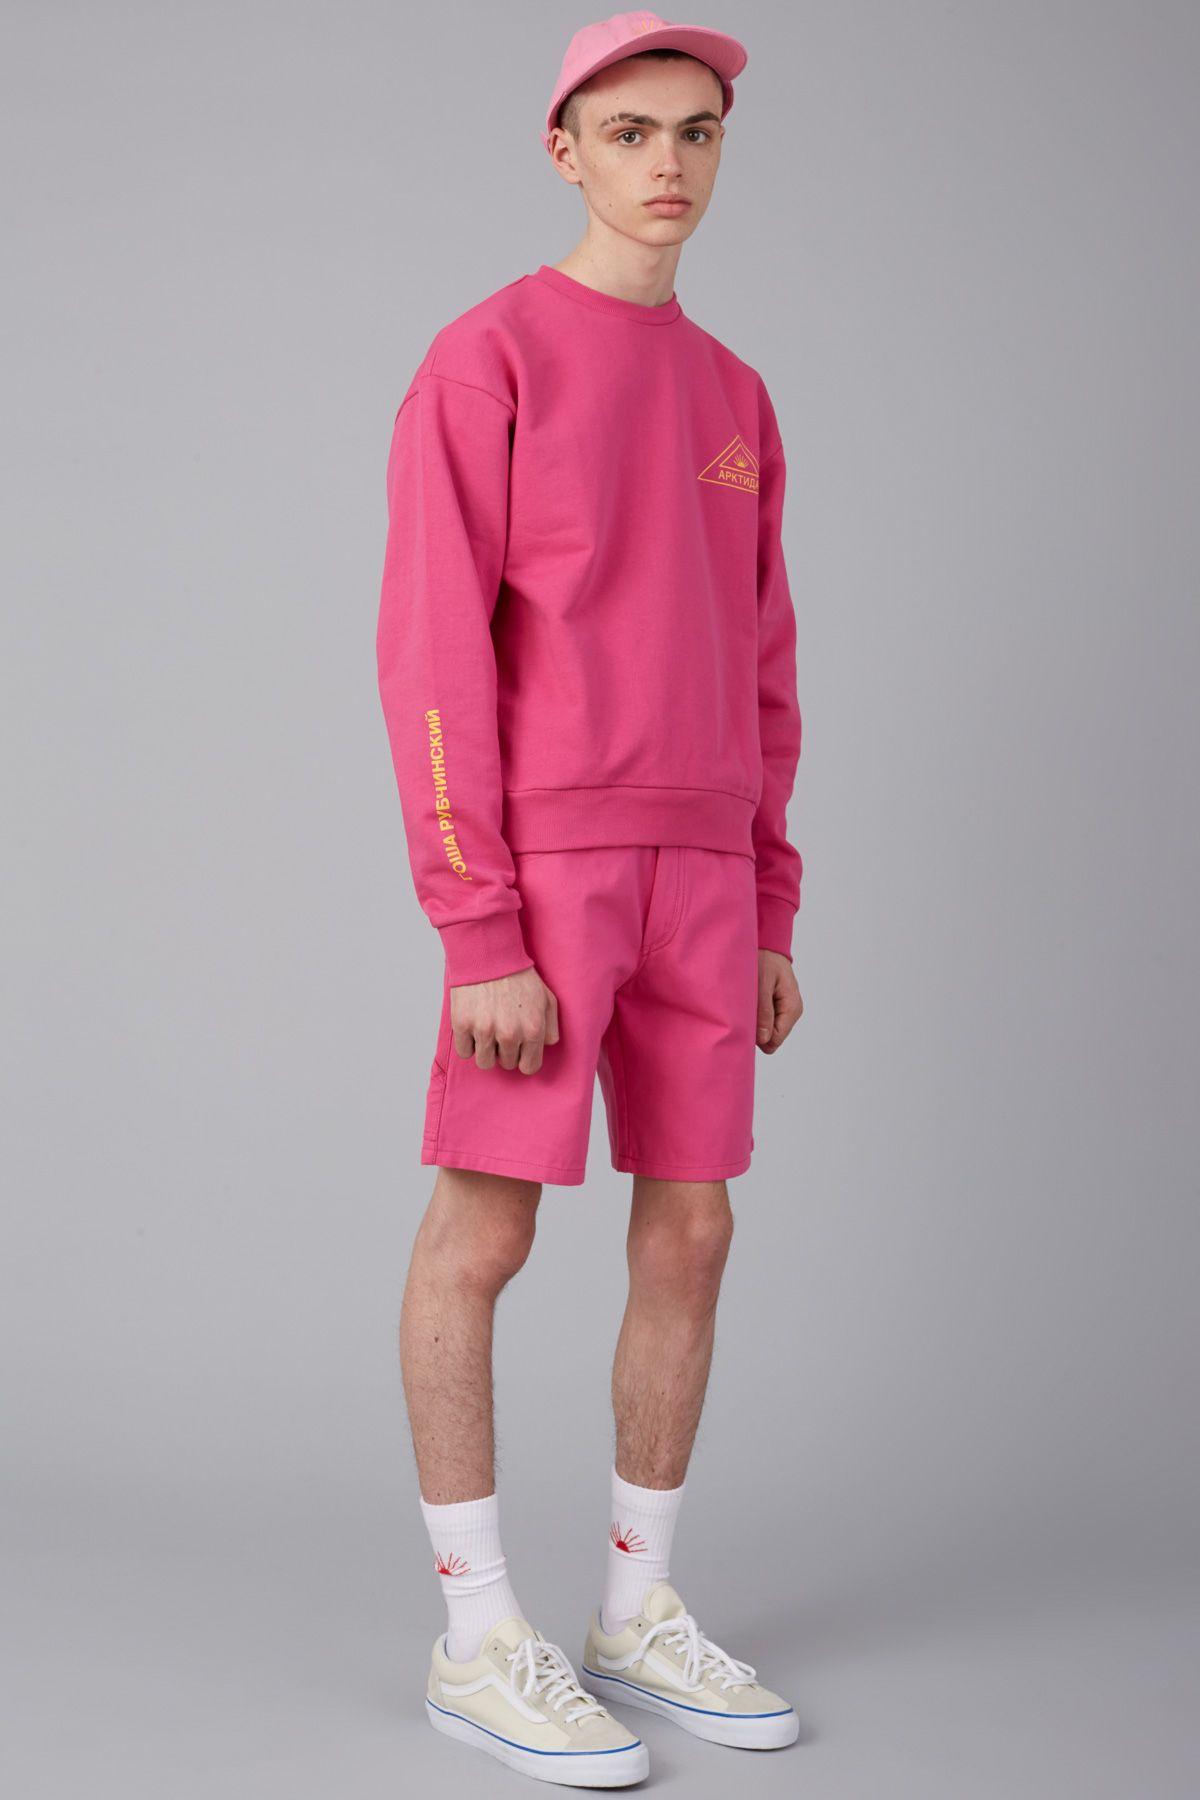 Gosha Rubchinskiy Printed Sleeve Sweatshirt - MEN - Tops - Gosha Rubchinskiy - OPENING CEREMONY  | menswear streetwear skater